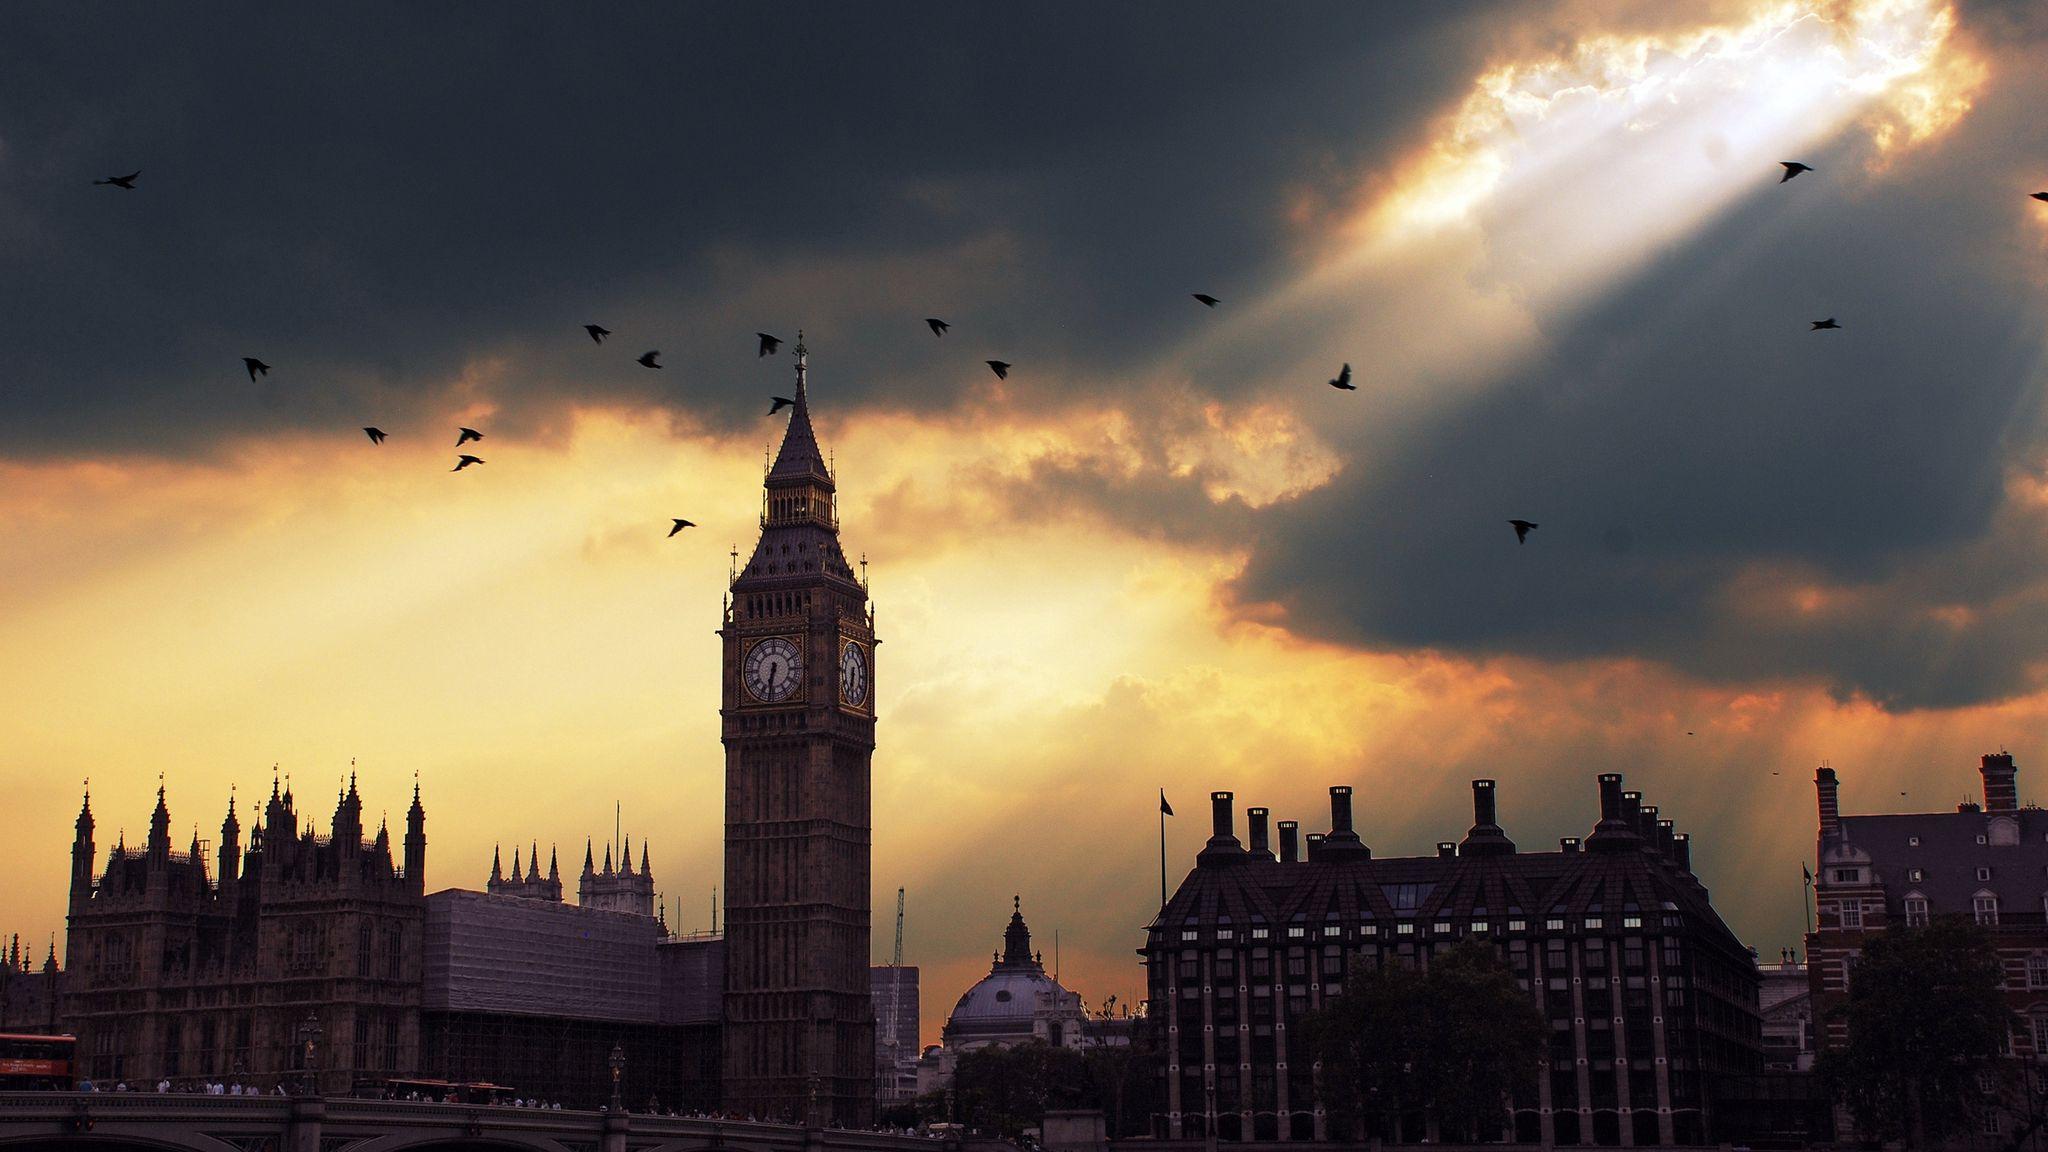 2048x1152 Wallpaper london, big ben, sunset, shadow, sky